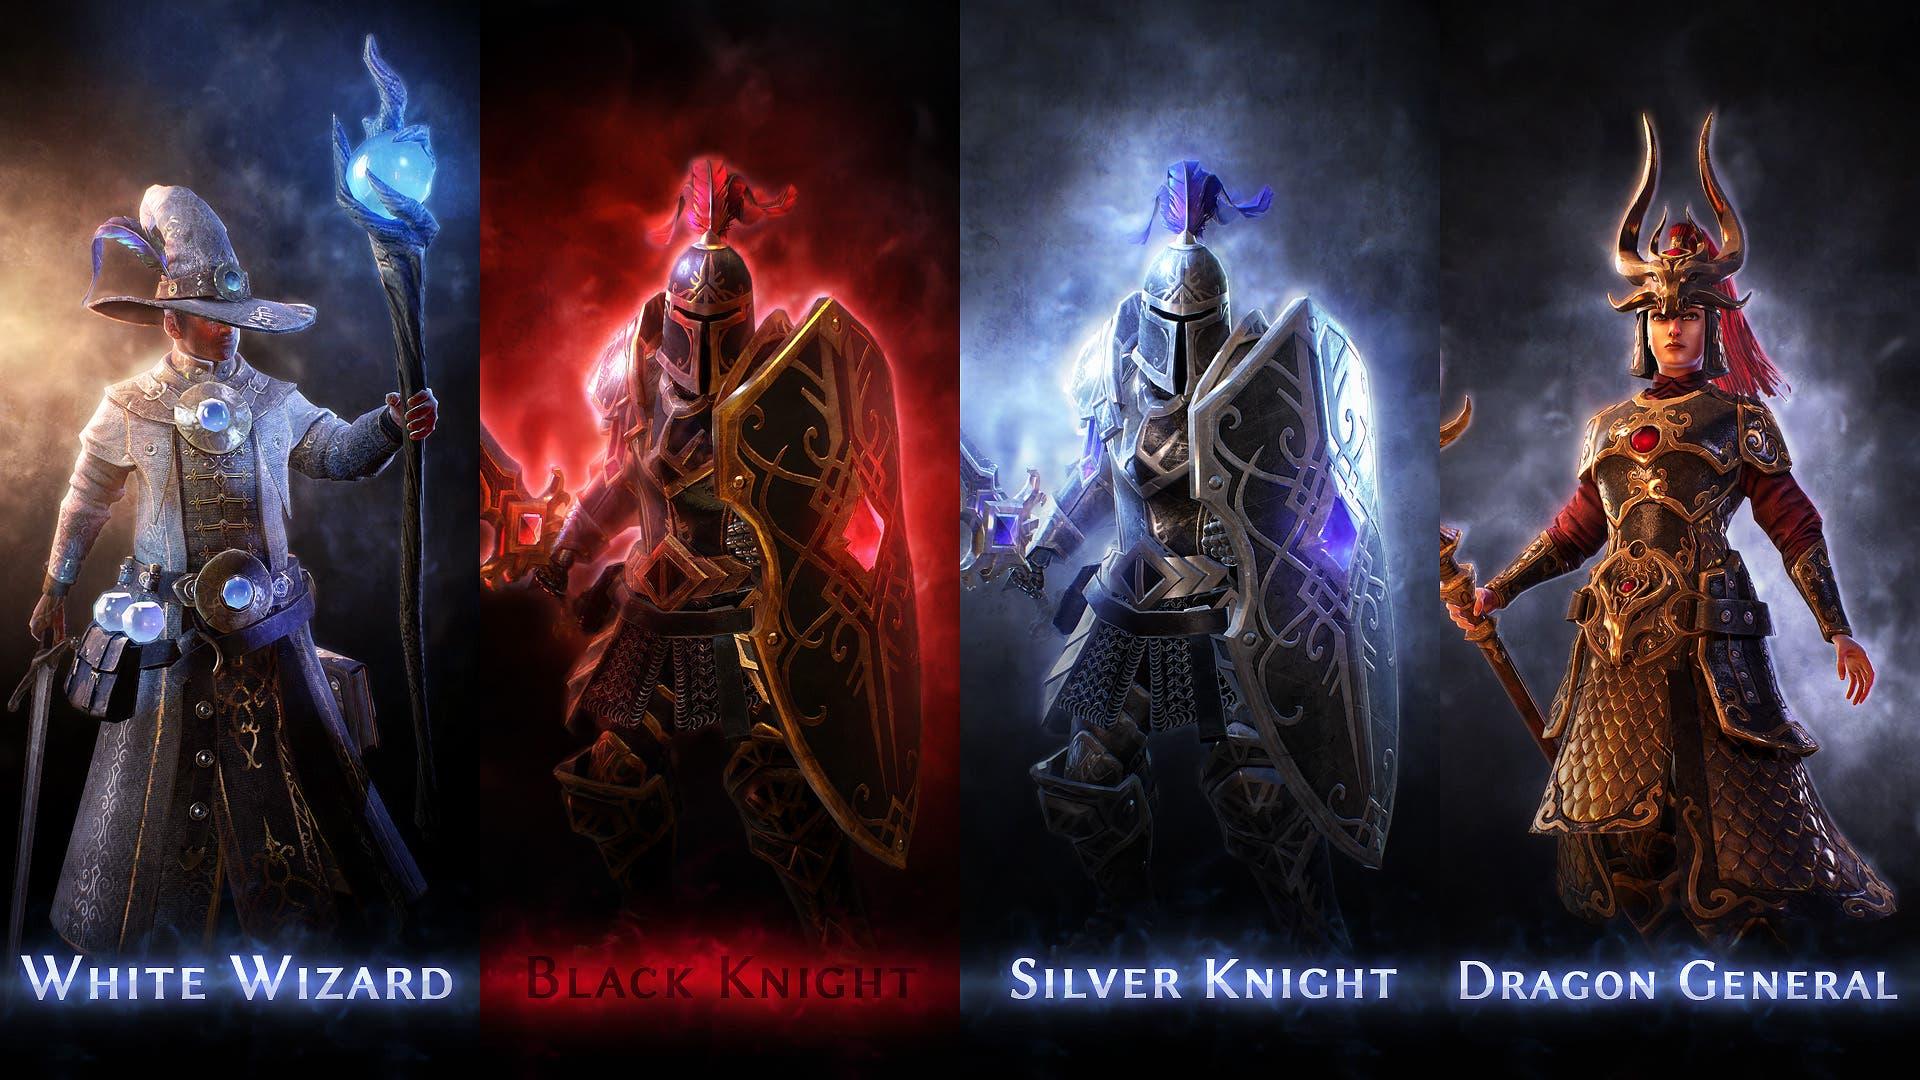 DLC Loyalist02 Sets01